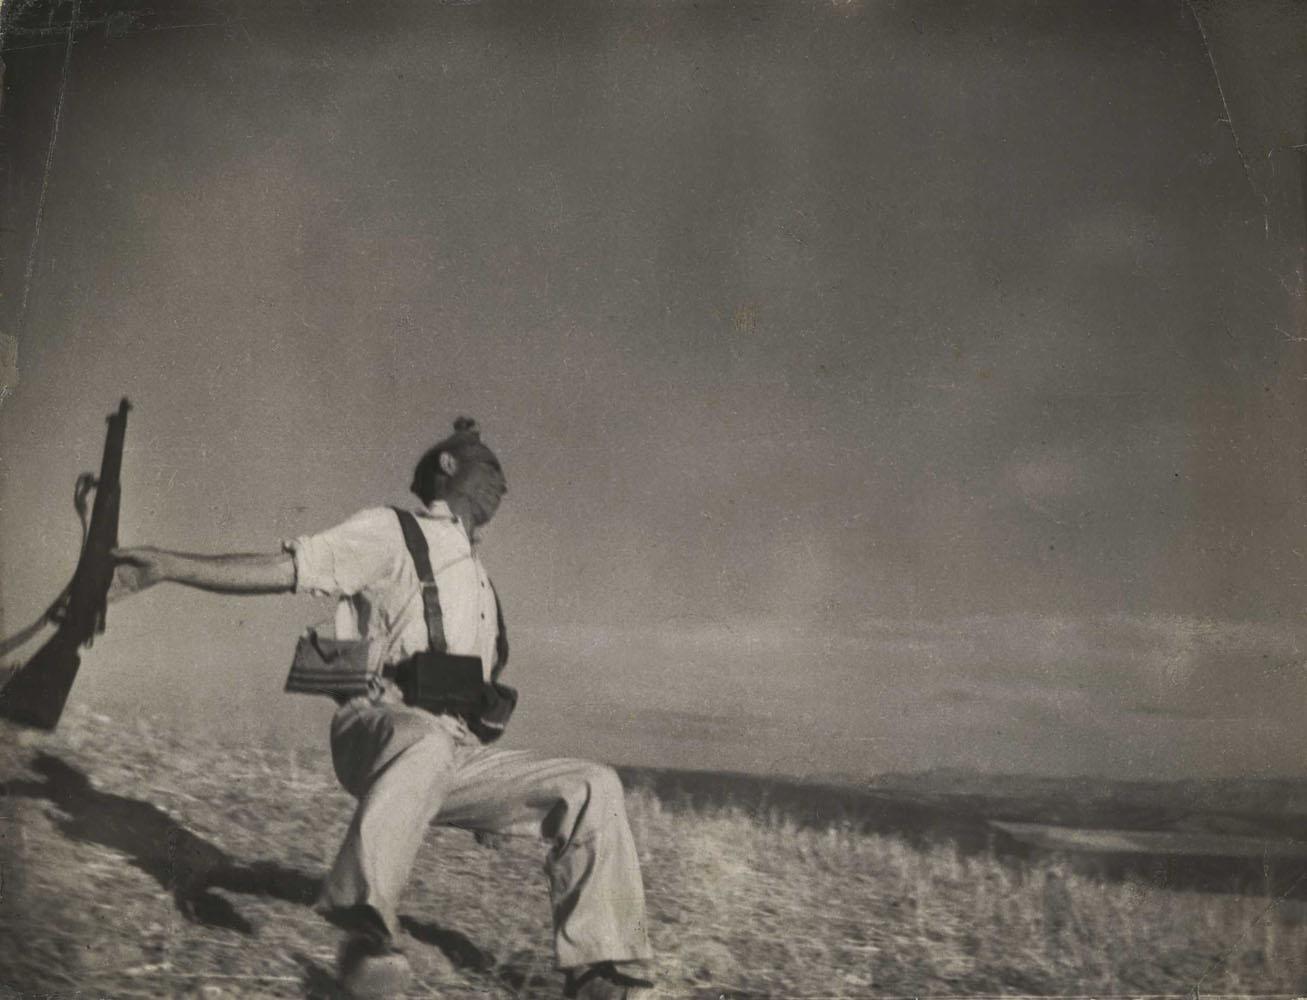 Death of a Loyalist Militiaman, Córdoba front Spain                               Late Aug.–early Sept. 1936                               Robert Capa, American, born Hungary, 1913–1954